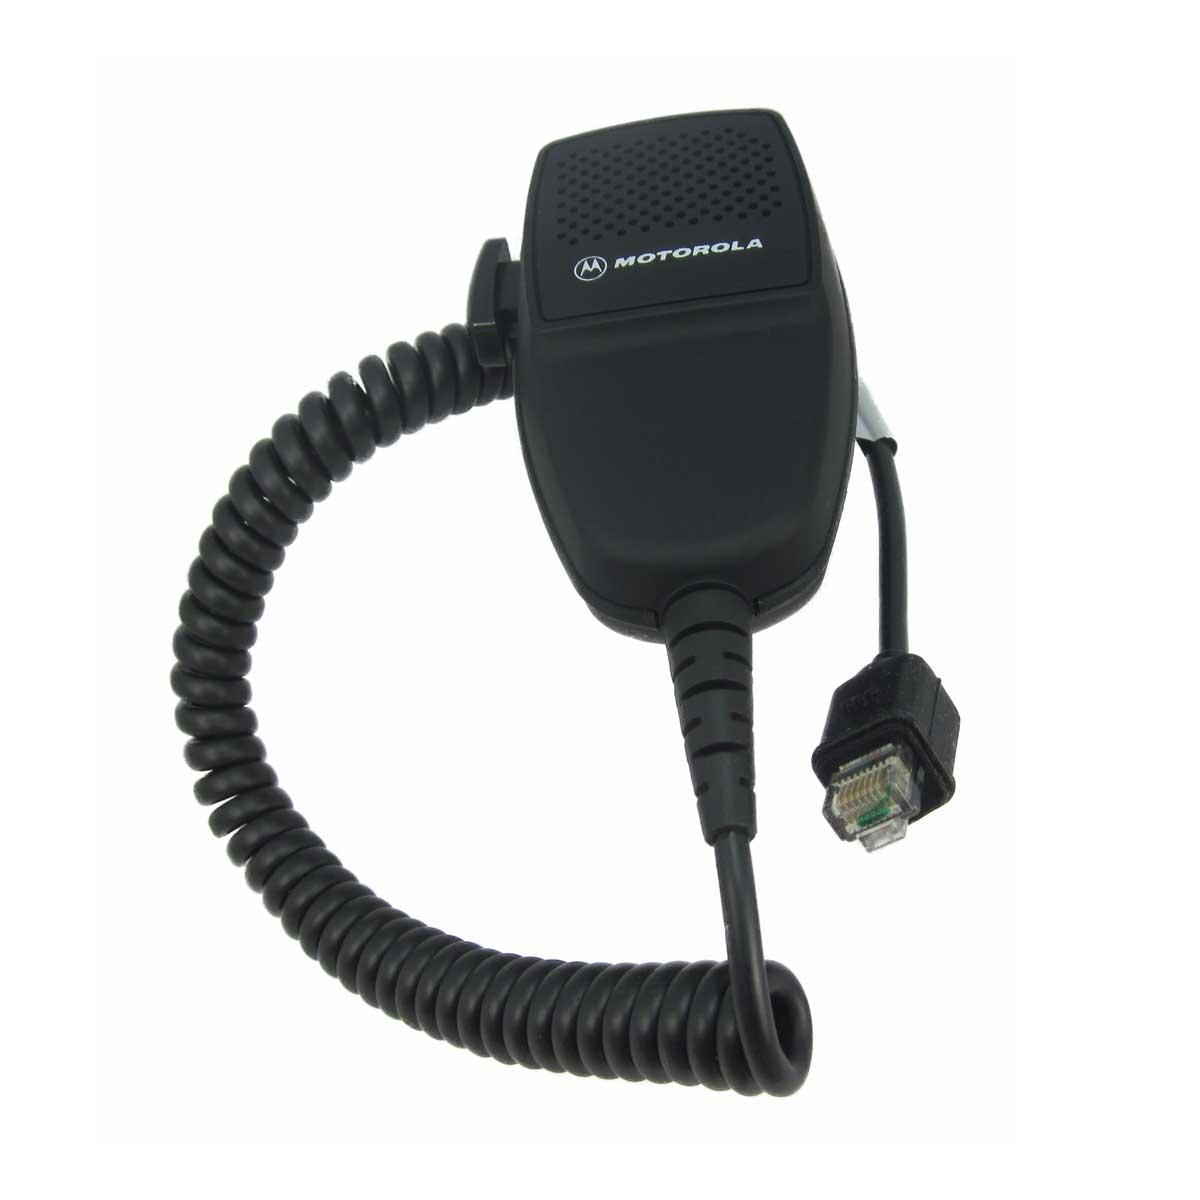 Micrófono Motorola para radio móvil PMMN4090